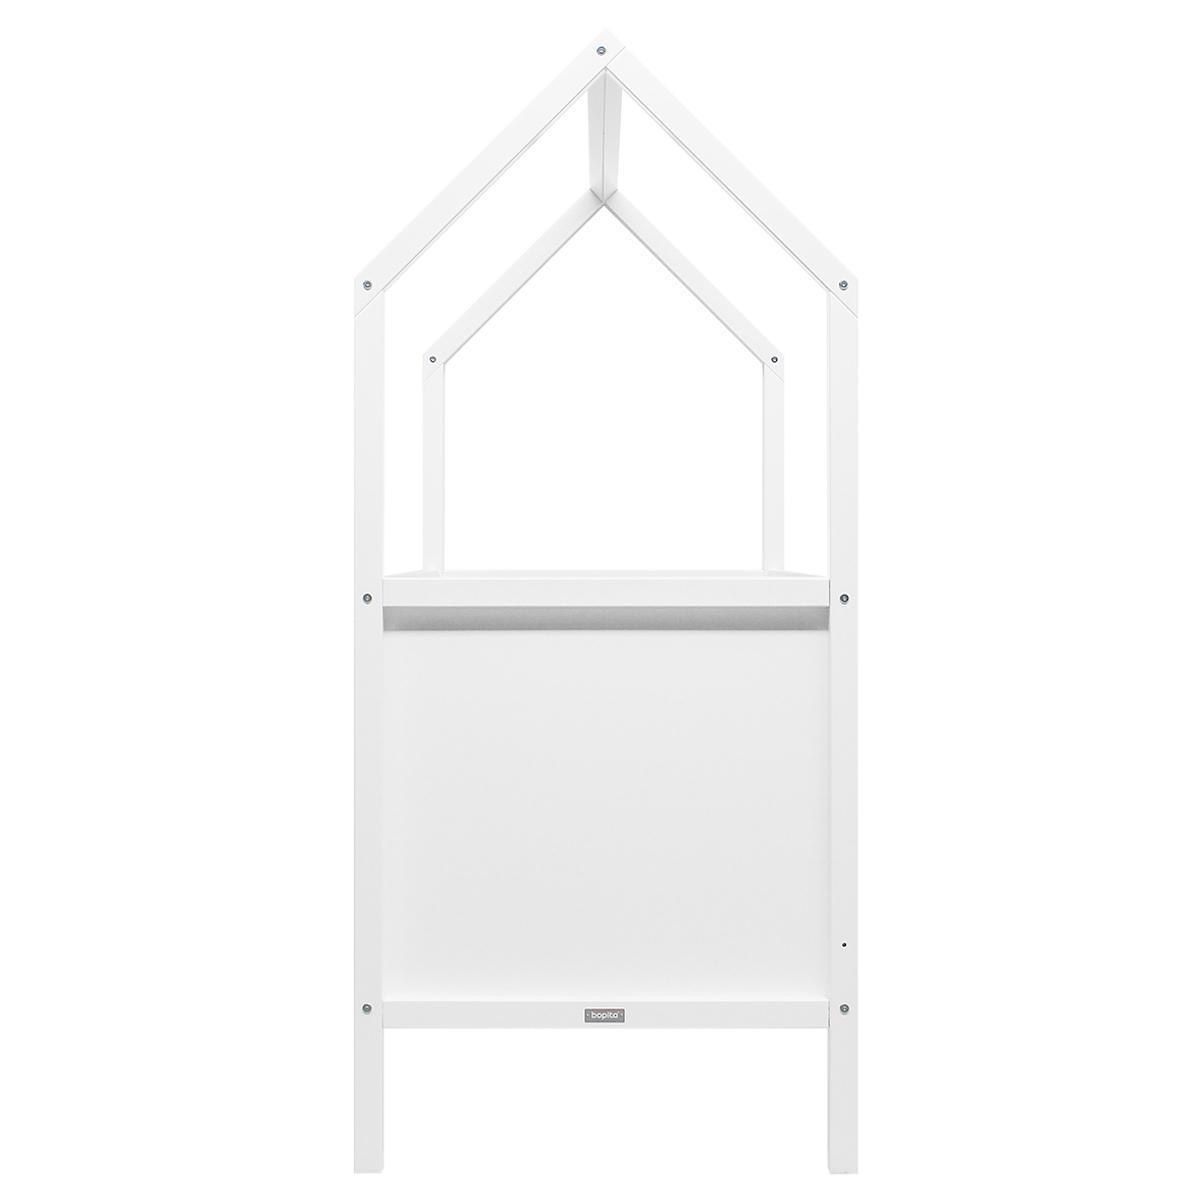 Lit banquette 70x140cm MY FIRST HOUSE Bopita blanc